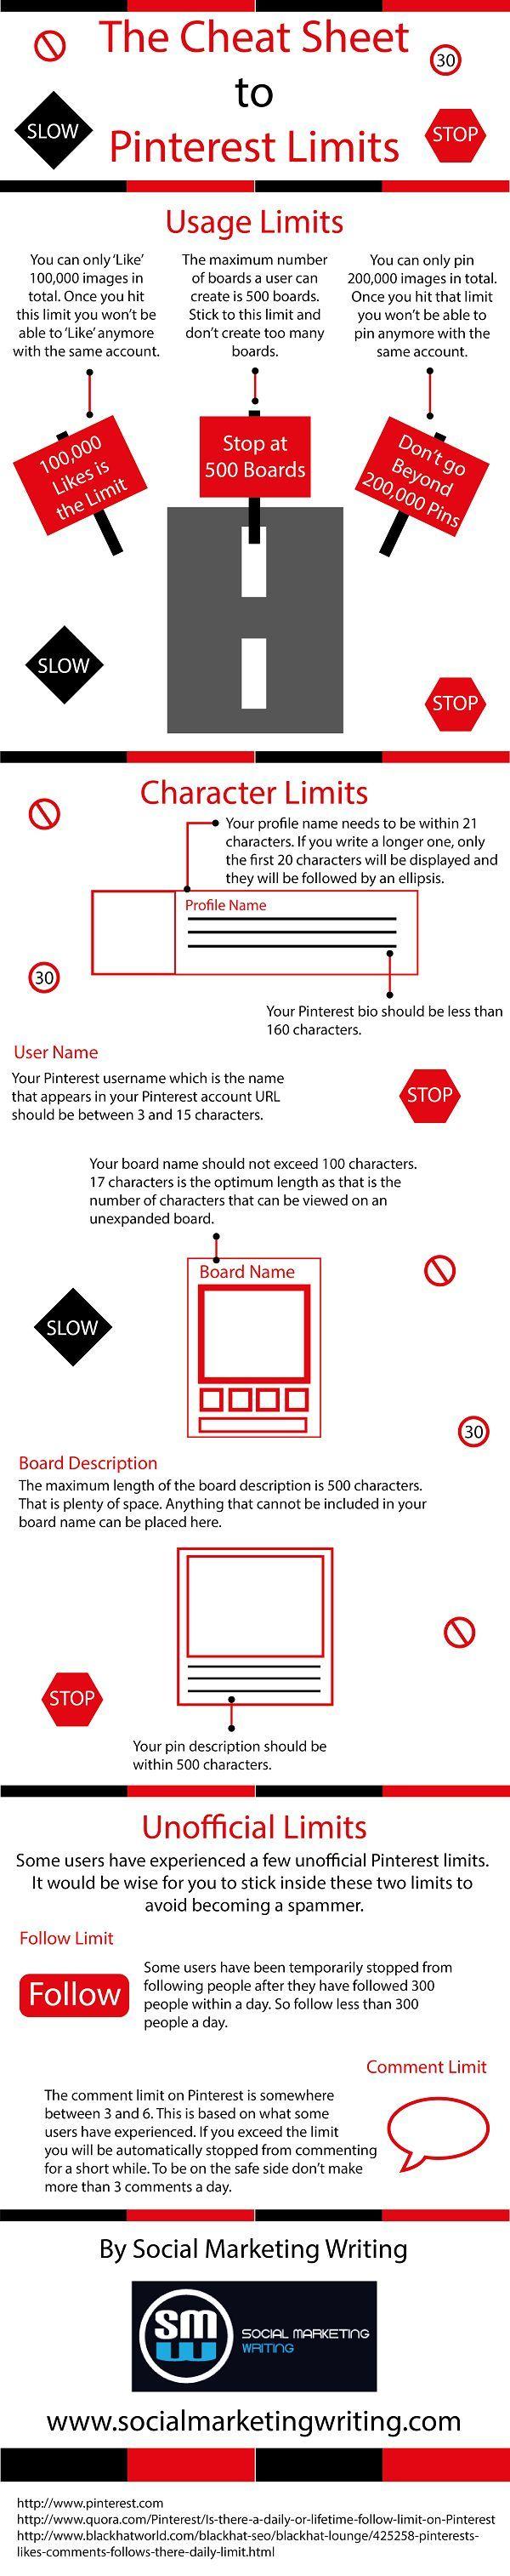 The Cheat Sheet to Pinterest Limits [Infographic] http://socialmarketingwriting.com/cheat-sheet-pinterest-limits-infographic/